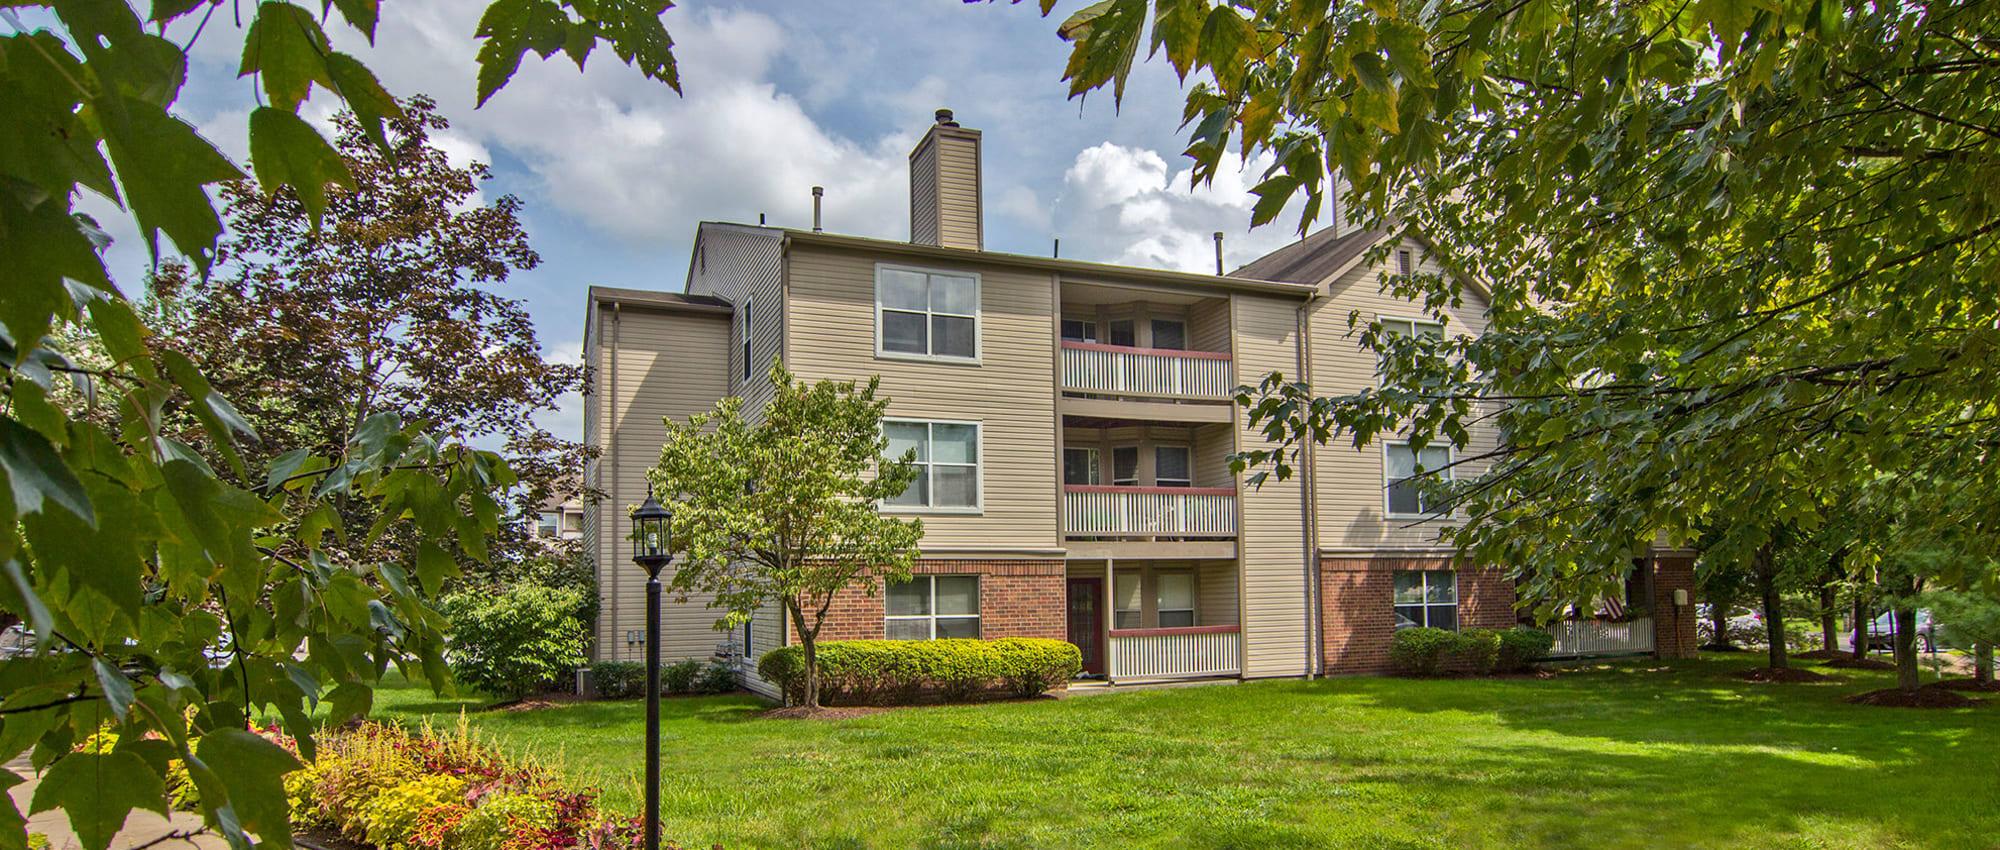 Apartments at Club at North Hills in Pittsburgh, Pennsylvania